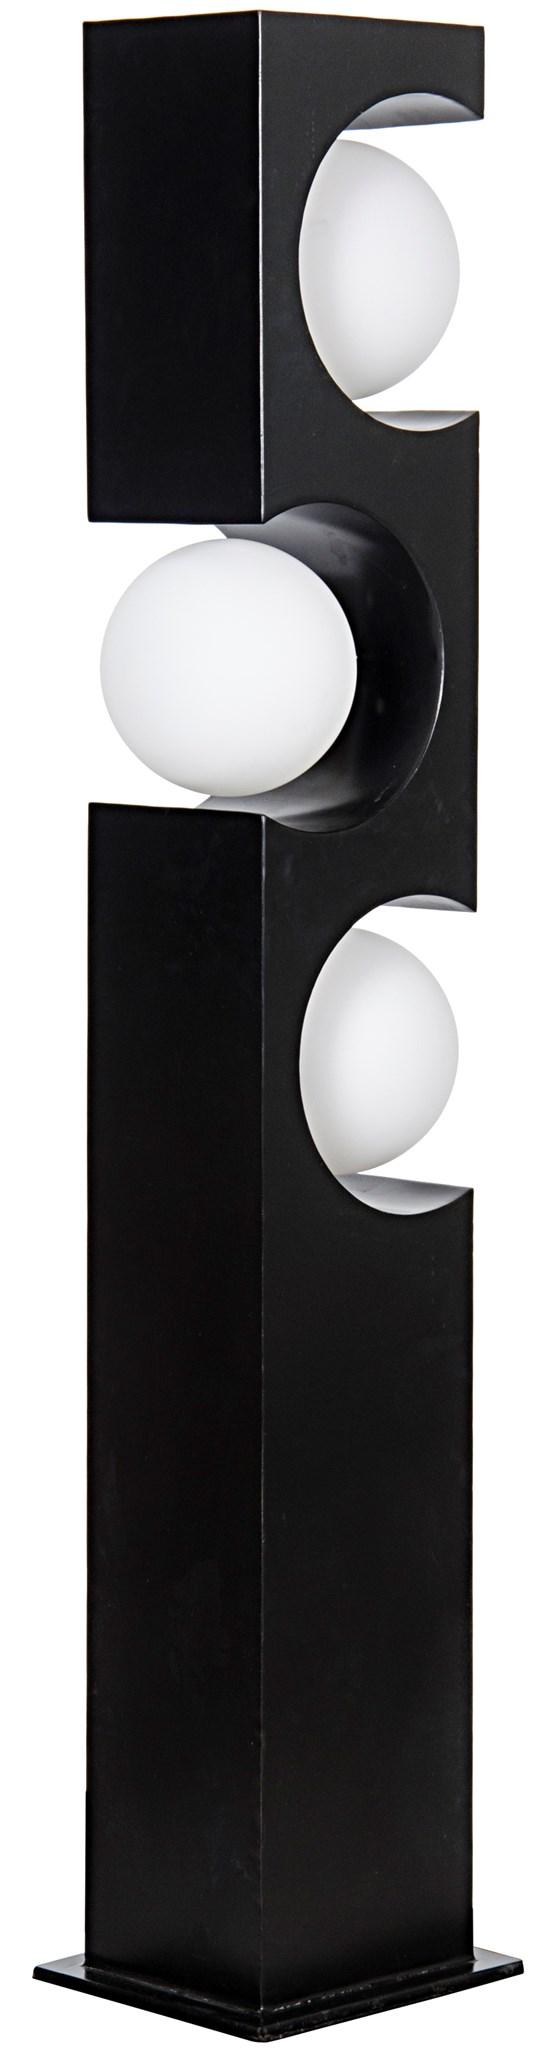 Monolite Floor Lamp, Large